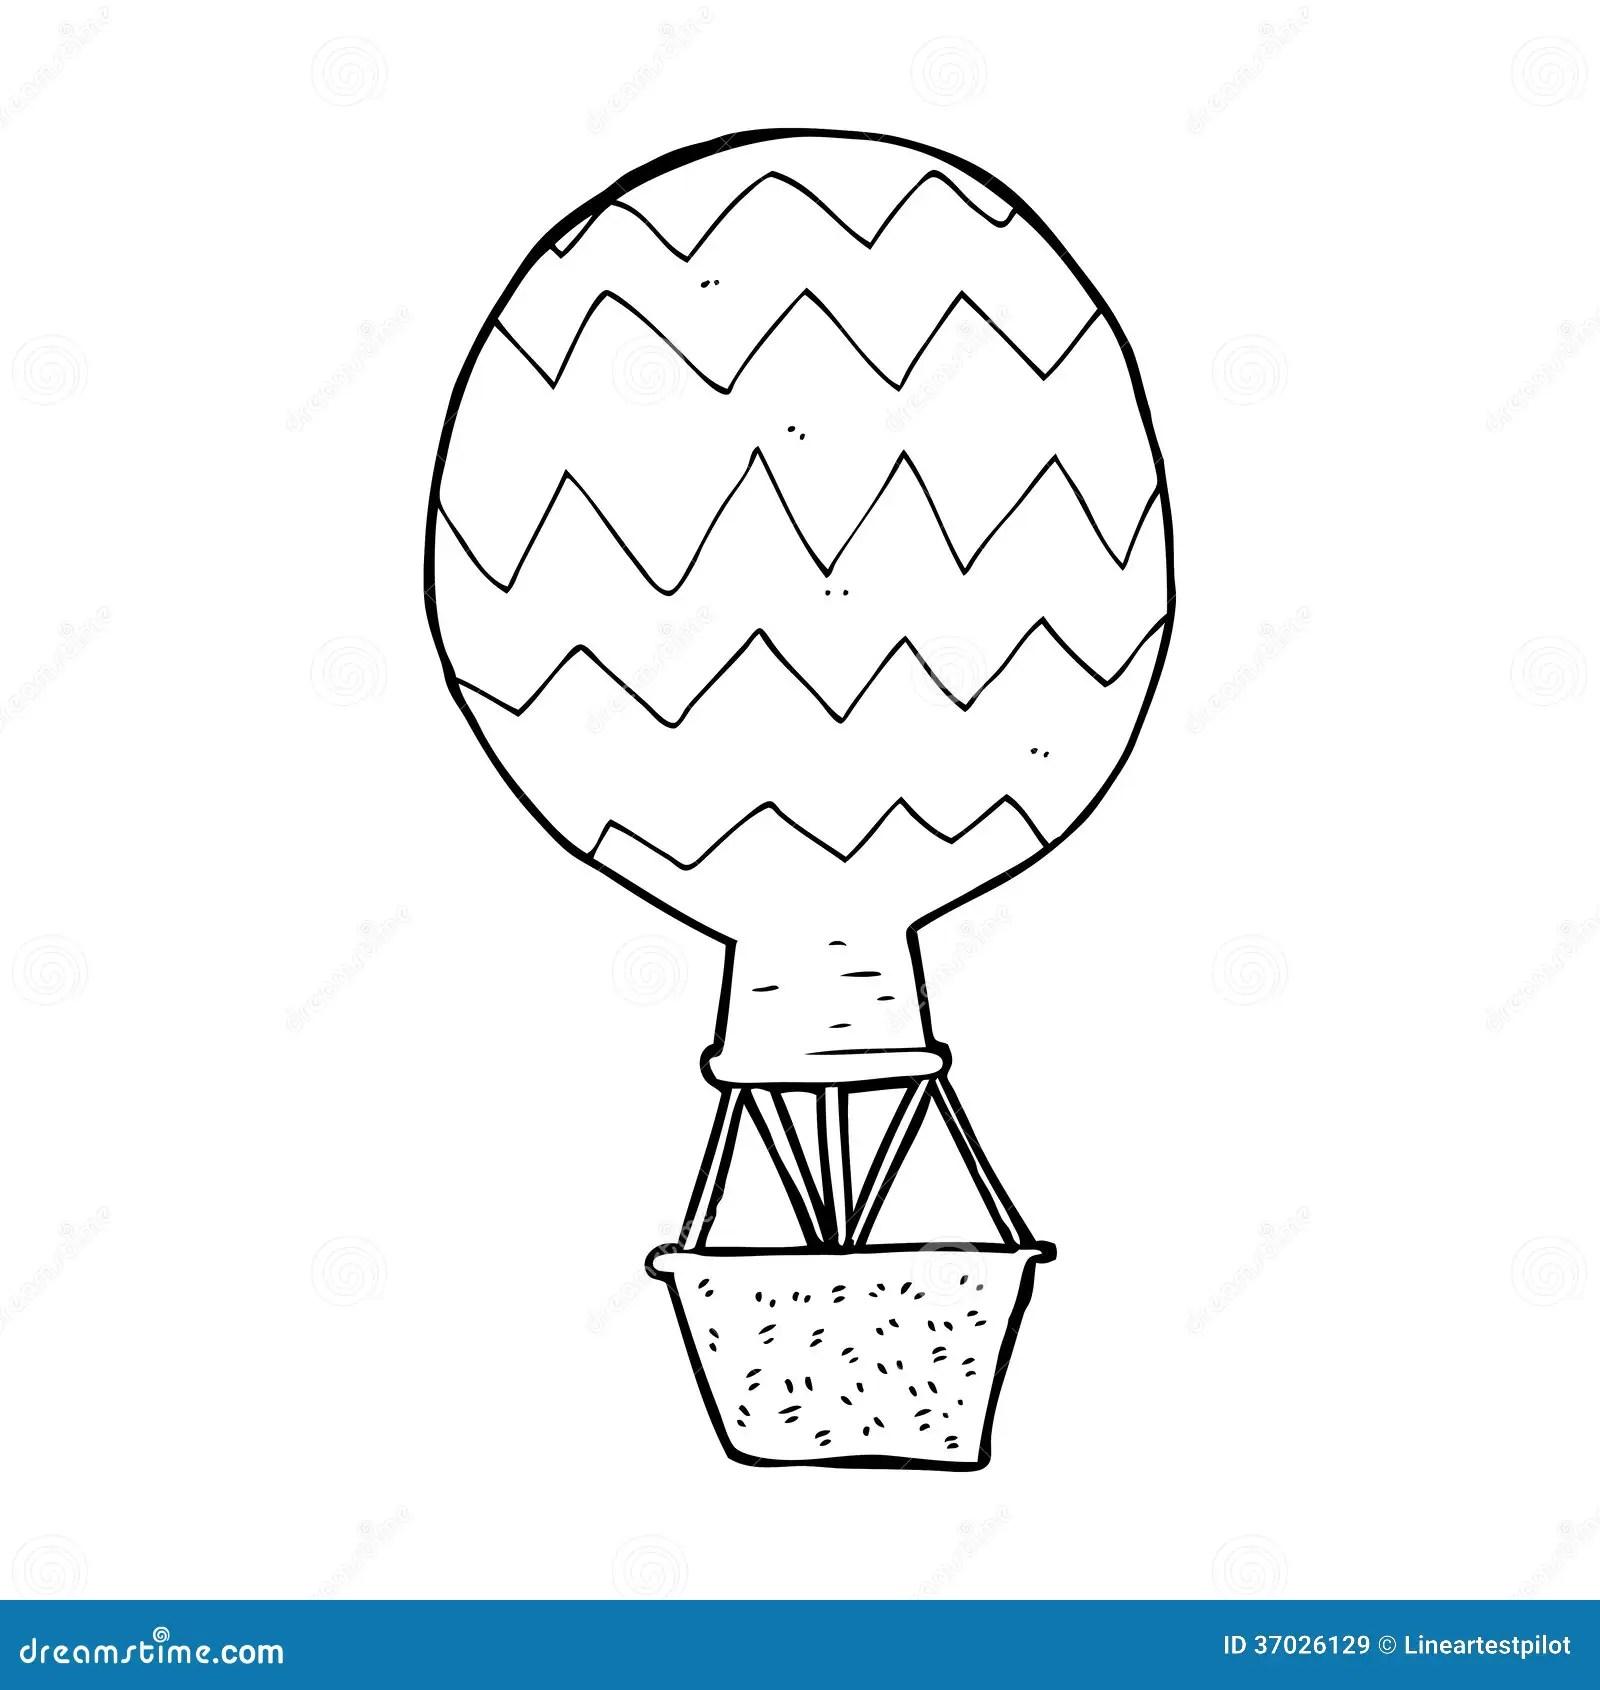 Cartoon Hot Air Balloon Royalty Free Stock Images